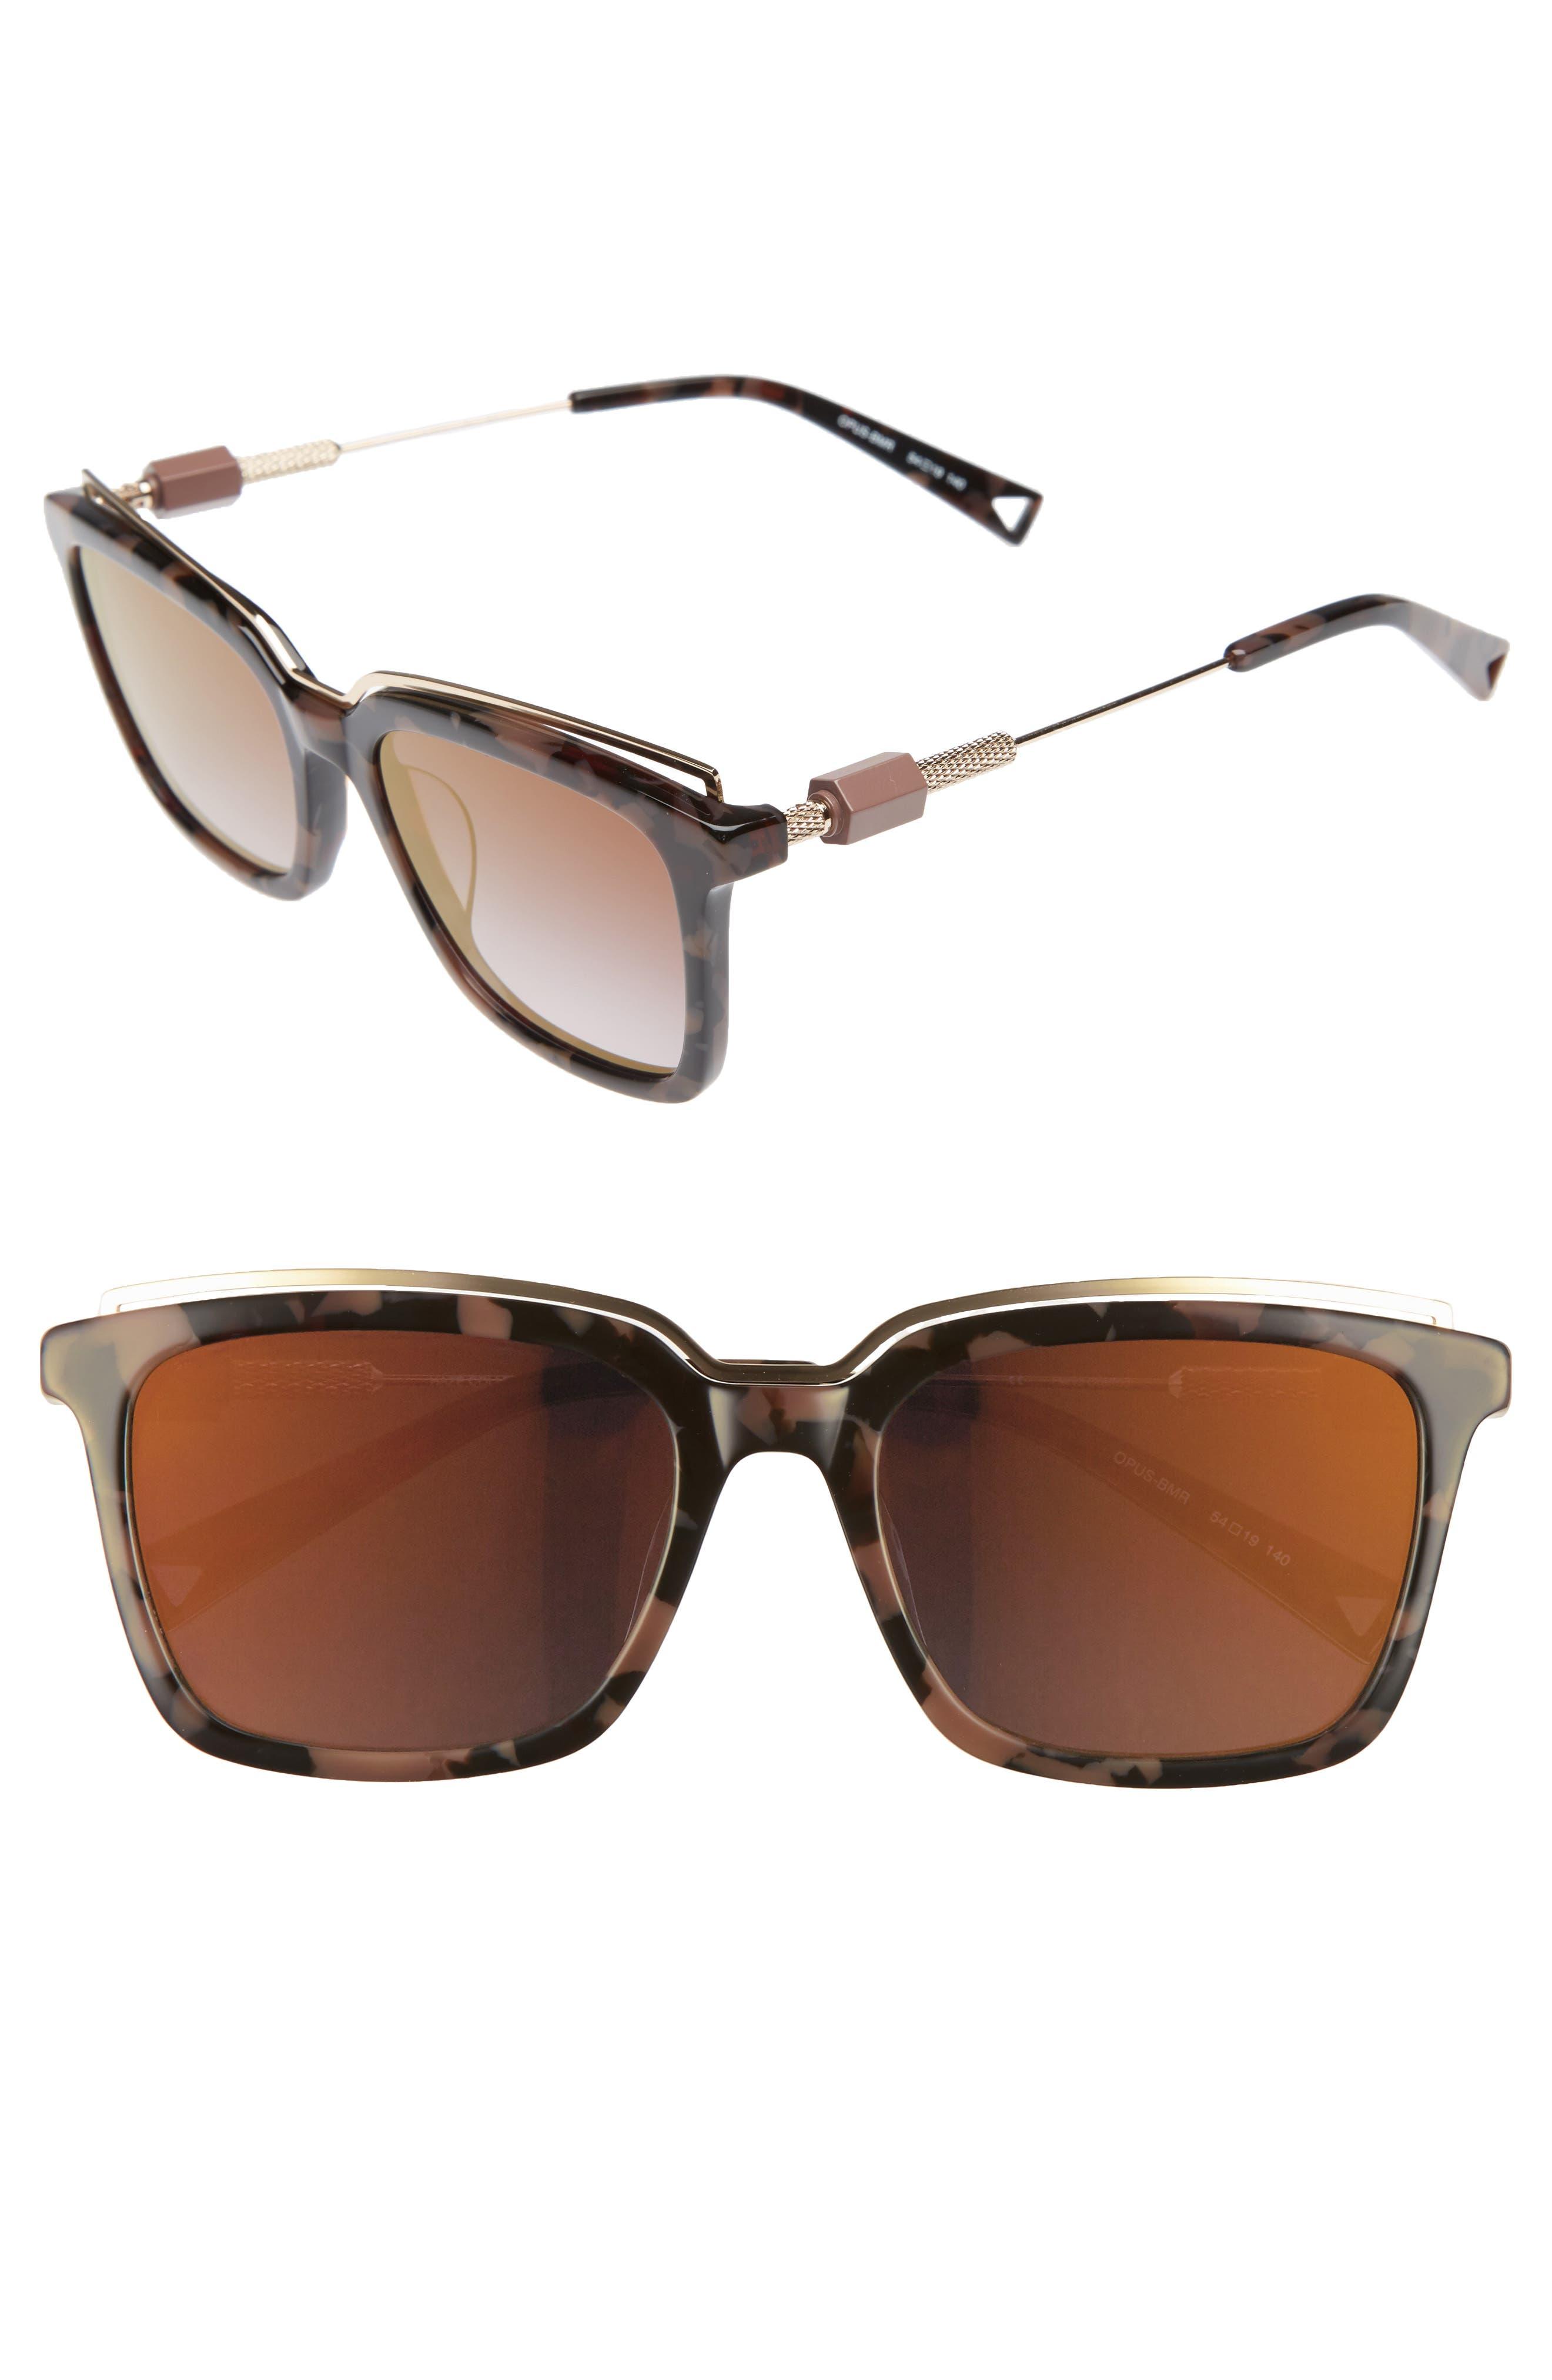 Opus 54mm Sunglasses,                             Main thumbnail 2, color,